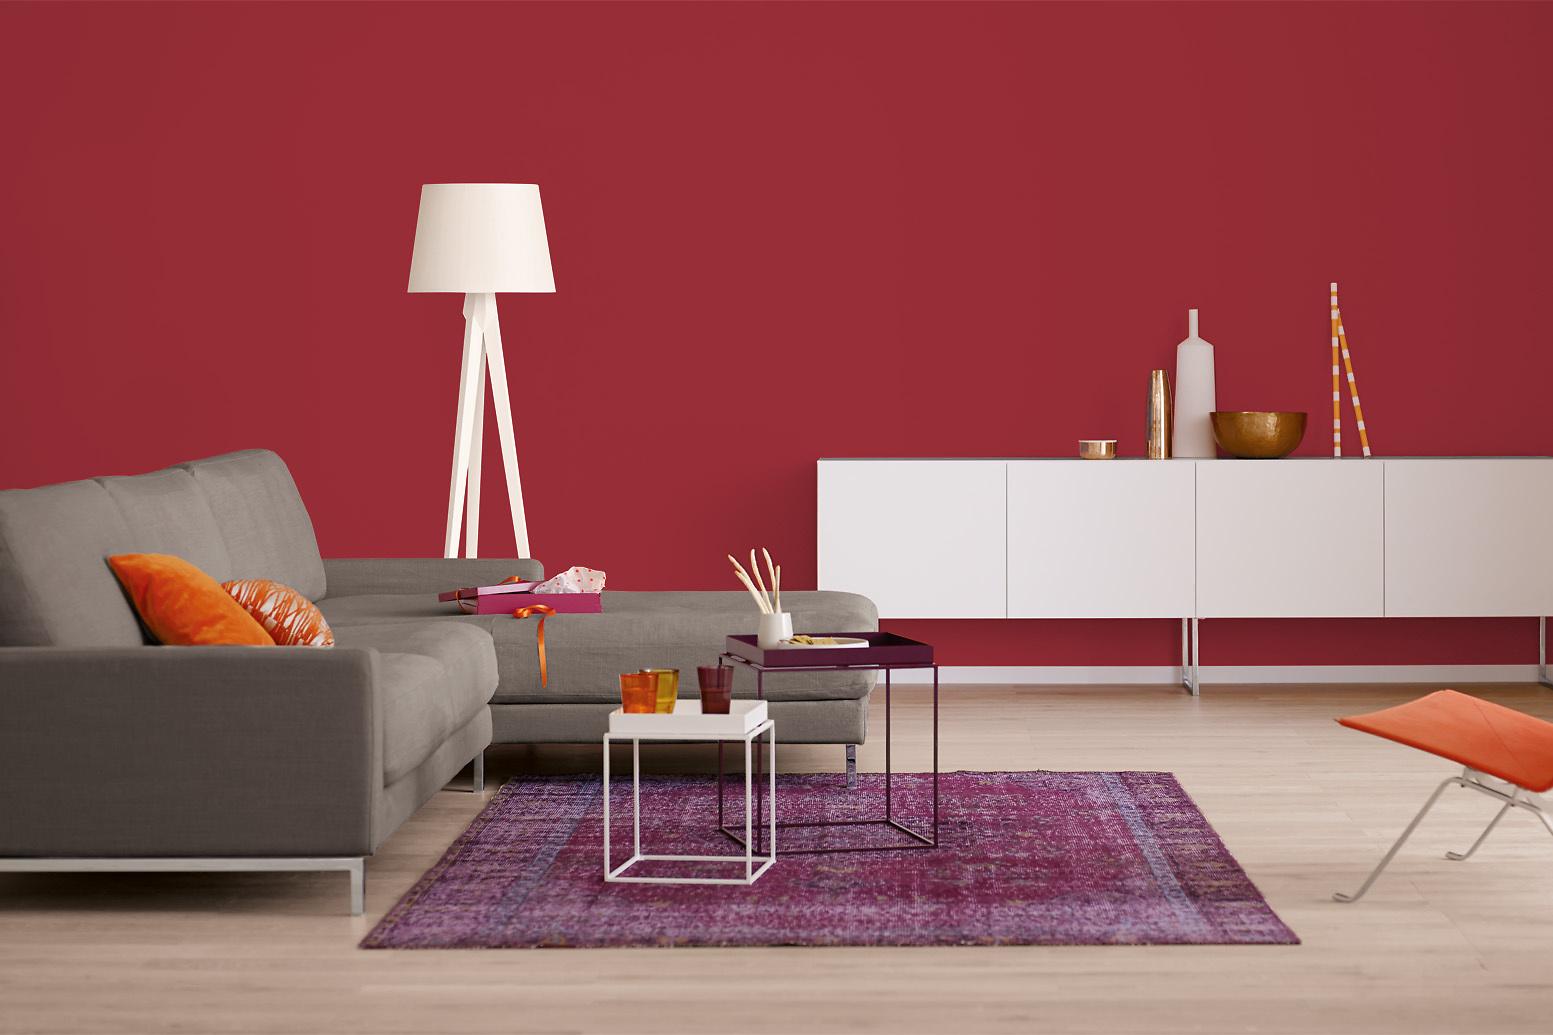 innenfarbe in rot tiefrot streichen alpina farbrezepte. Black Bedroom Furniture Sets. Home Design Ideas